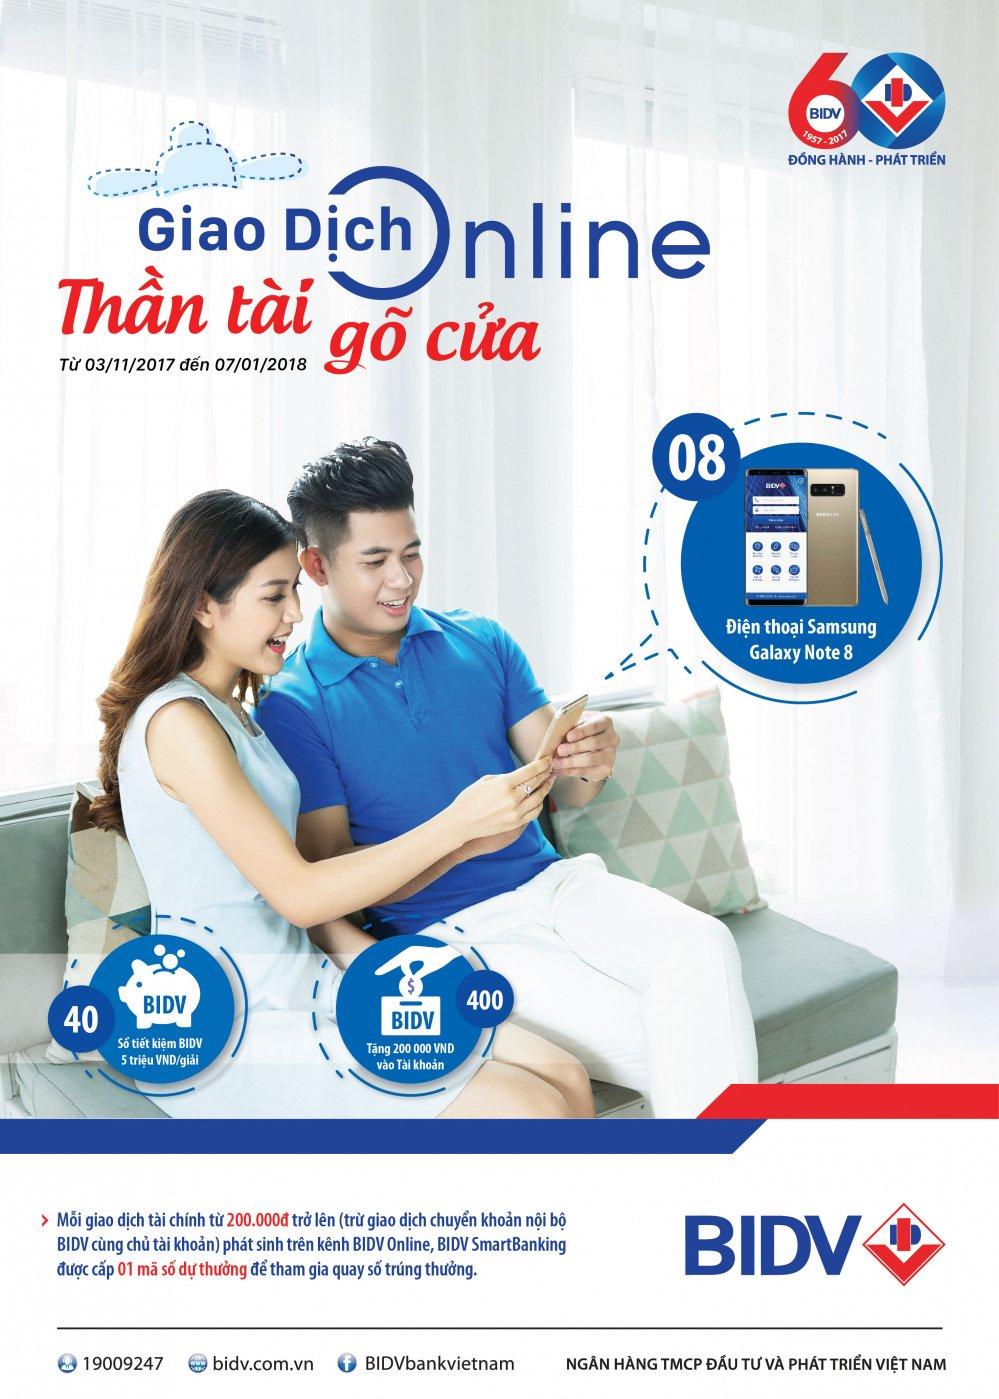 Giao dich Online nhanh tay cung BIDV e-Banking va don ngay 'Than tai go cua' hinh anh 1